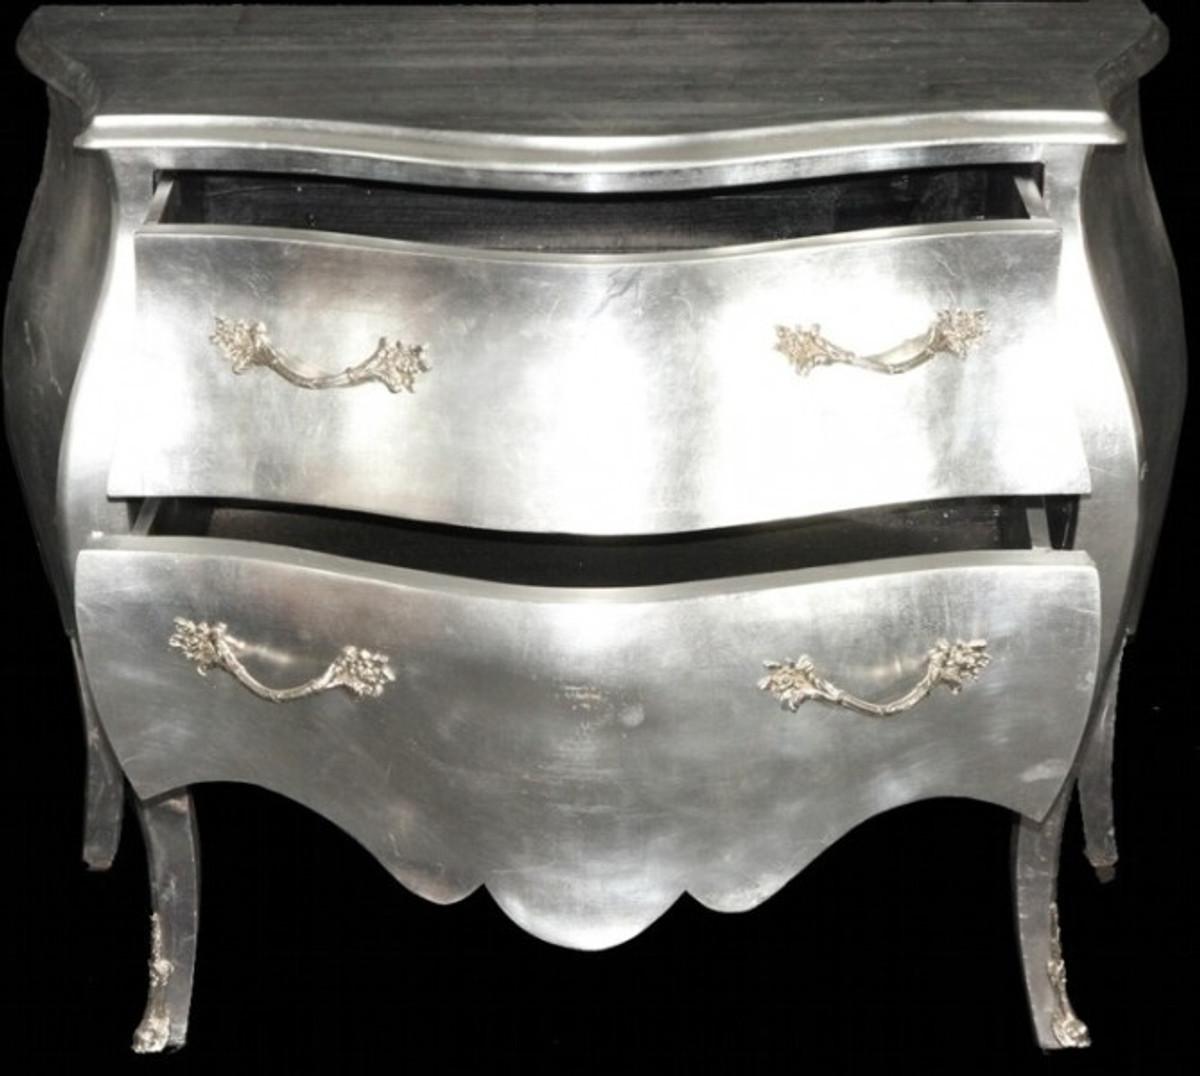 casa padrino barock kommode silber 100cm m bel schrank kommoden barock kommoden. Black Bedroom Furniture Sets. Home Design Ideas